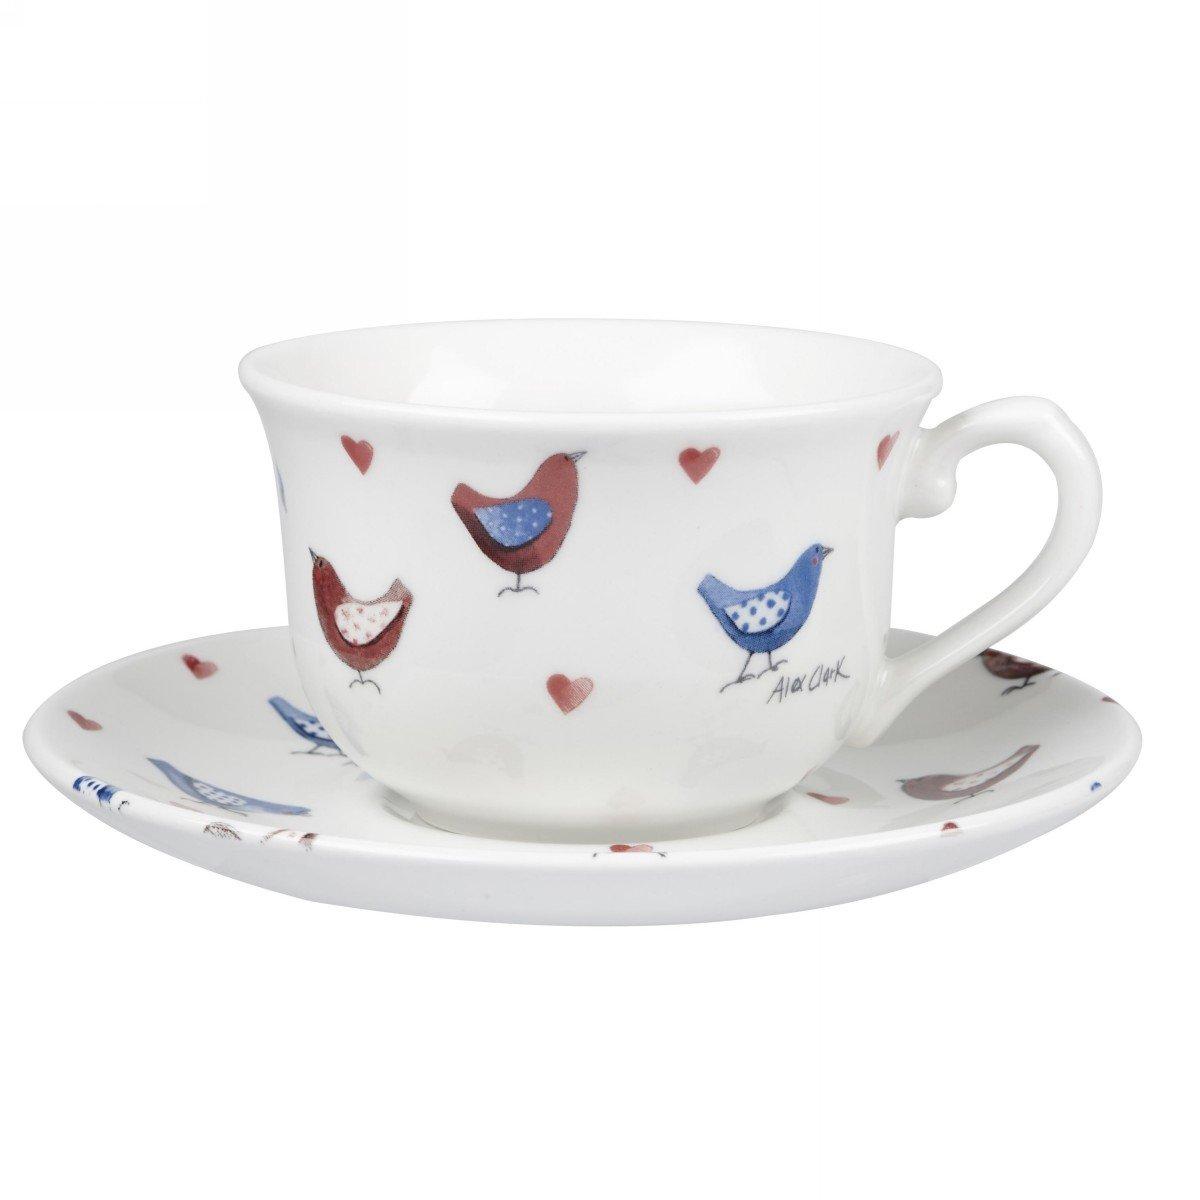 Чашка с блюдцем Churchill 200 мл Птички от Алекс Кларк